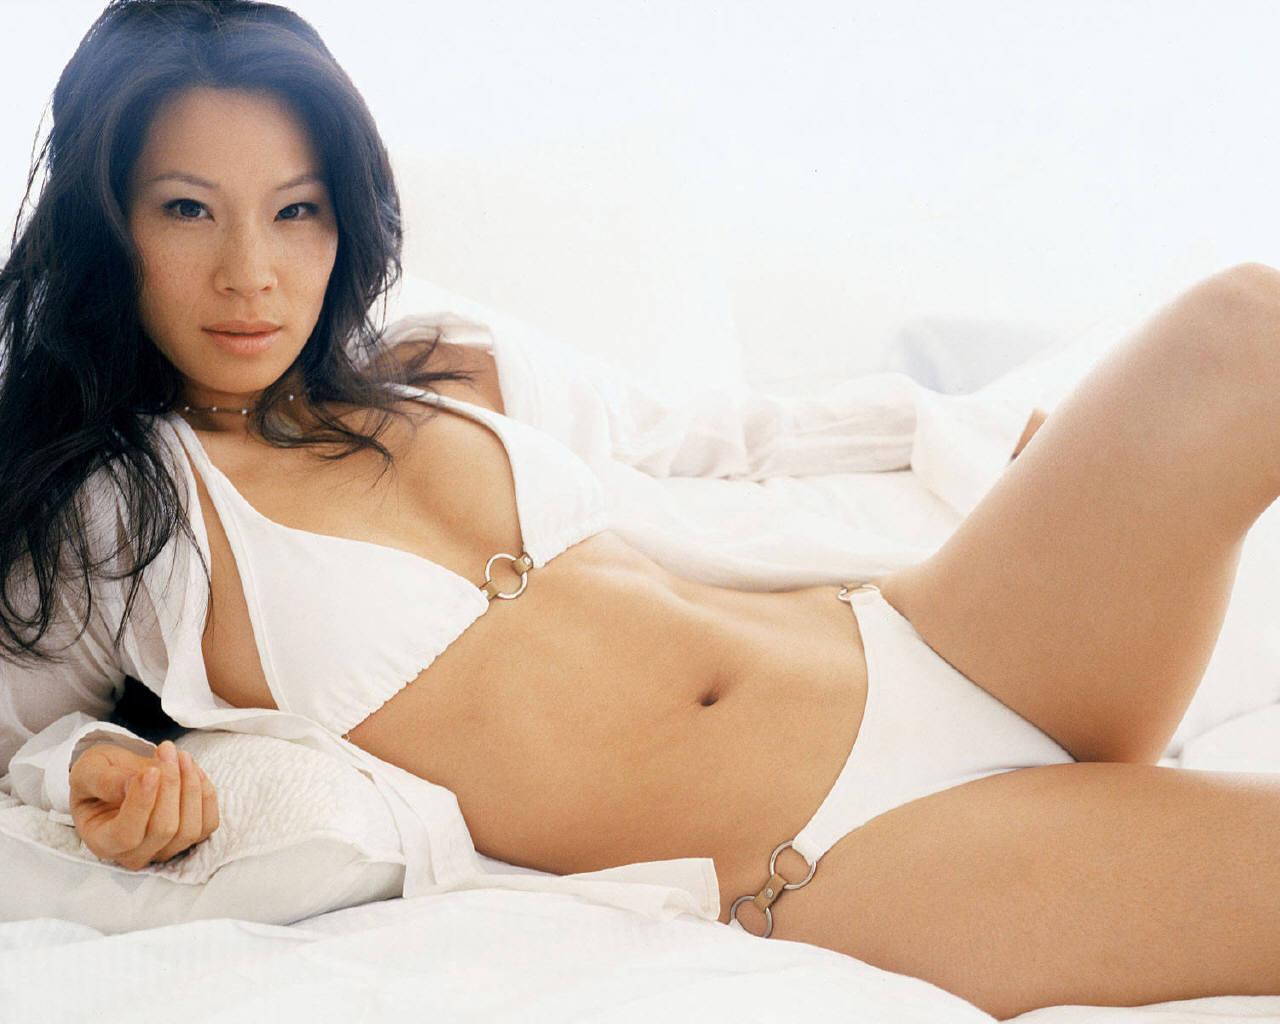 http://4.bp.blogspot.com/--J0zngkVg8k/Tm8ymOA5uyI/AAAAAAAAFEE/R0p0YSXh8UI/s1600/Lucy+Liu+%25281%2529.jpg